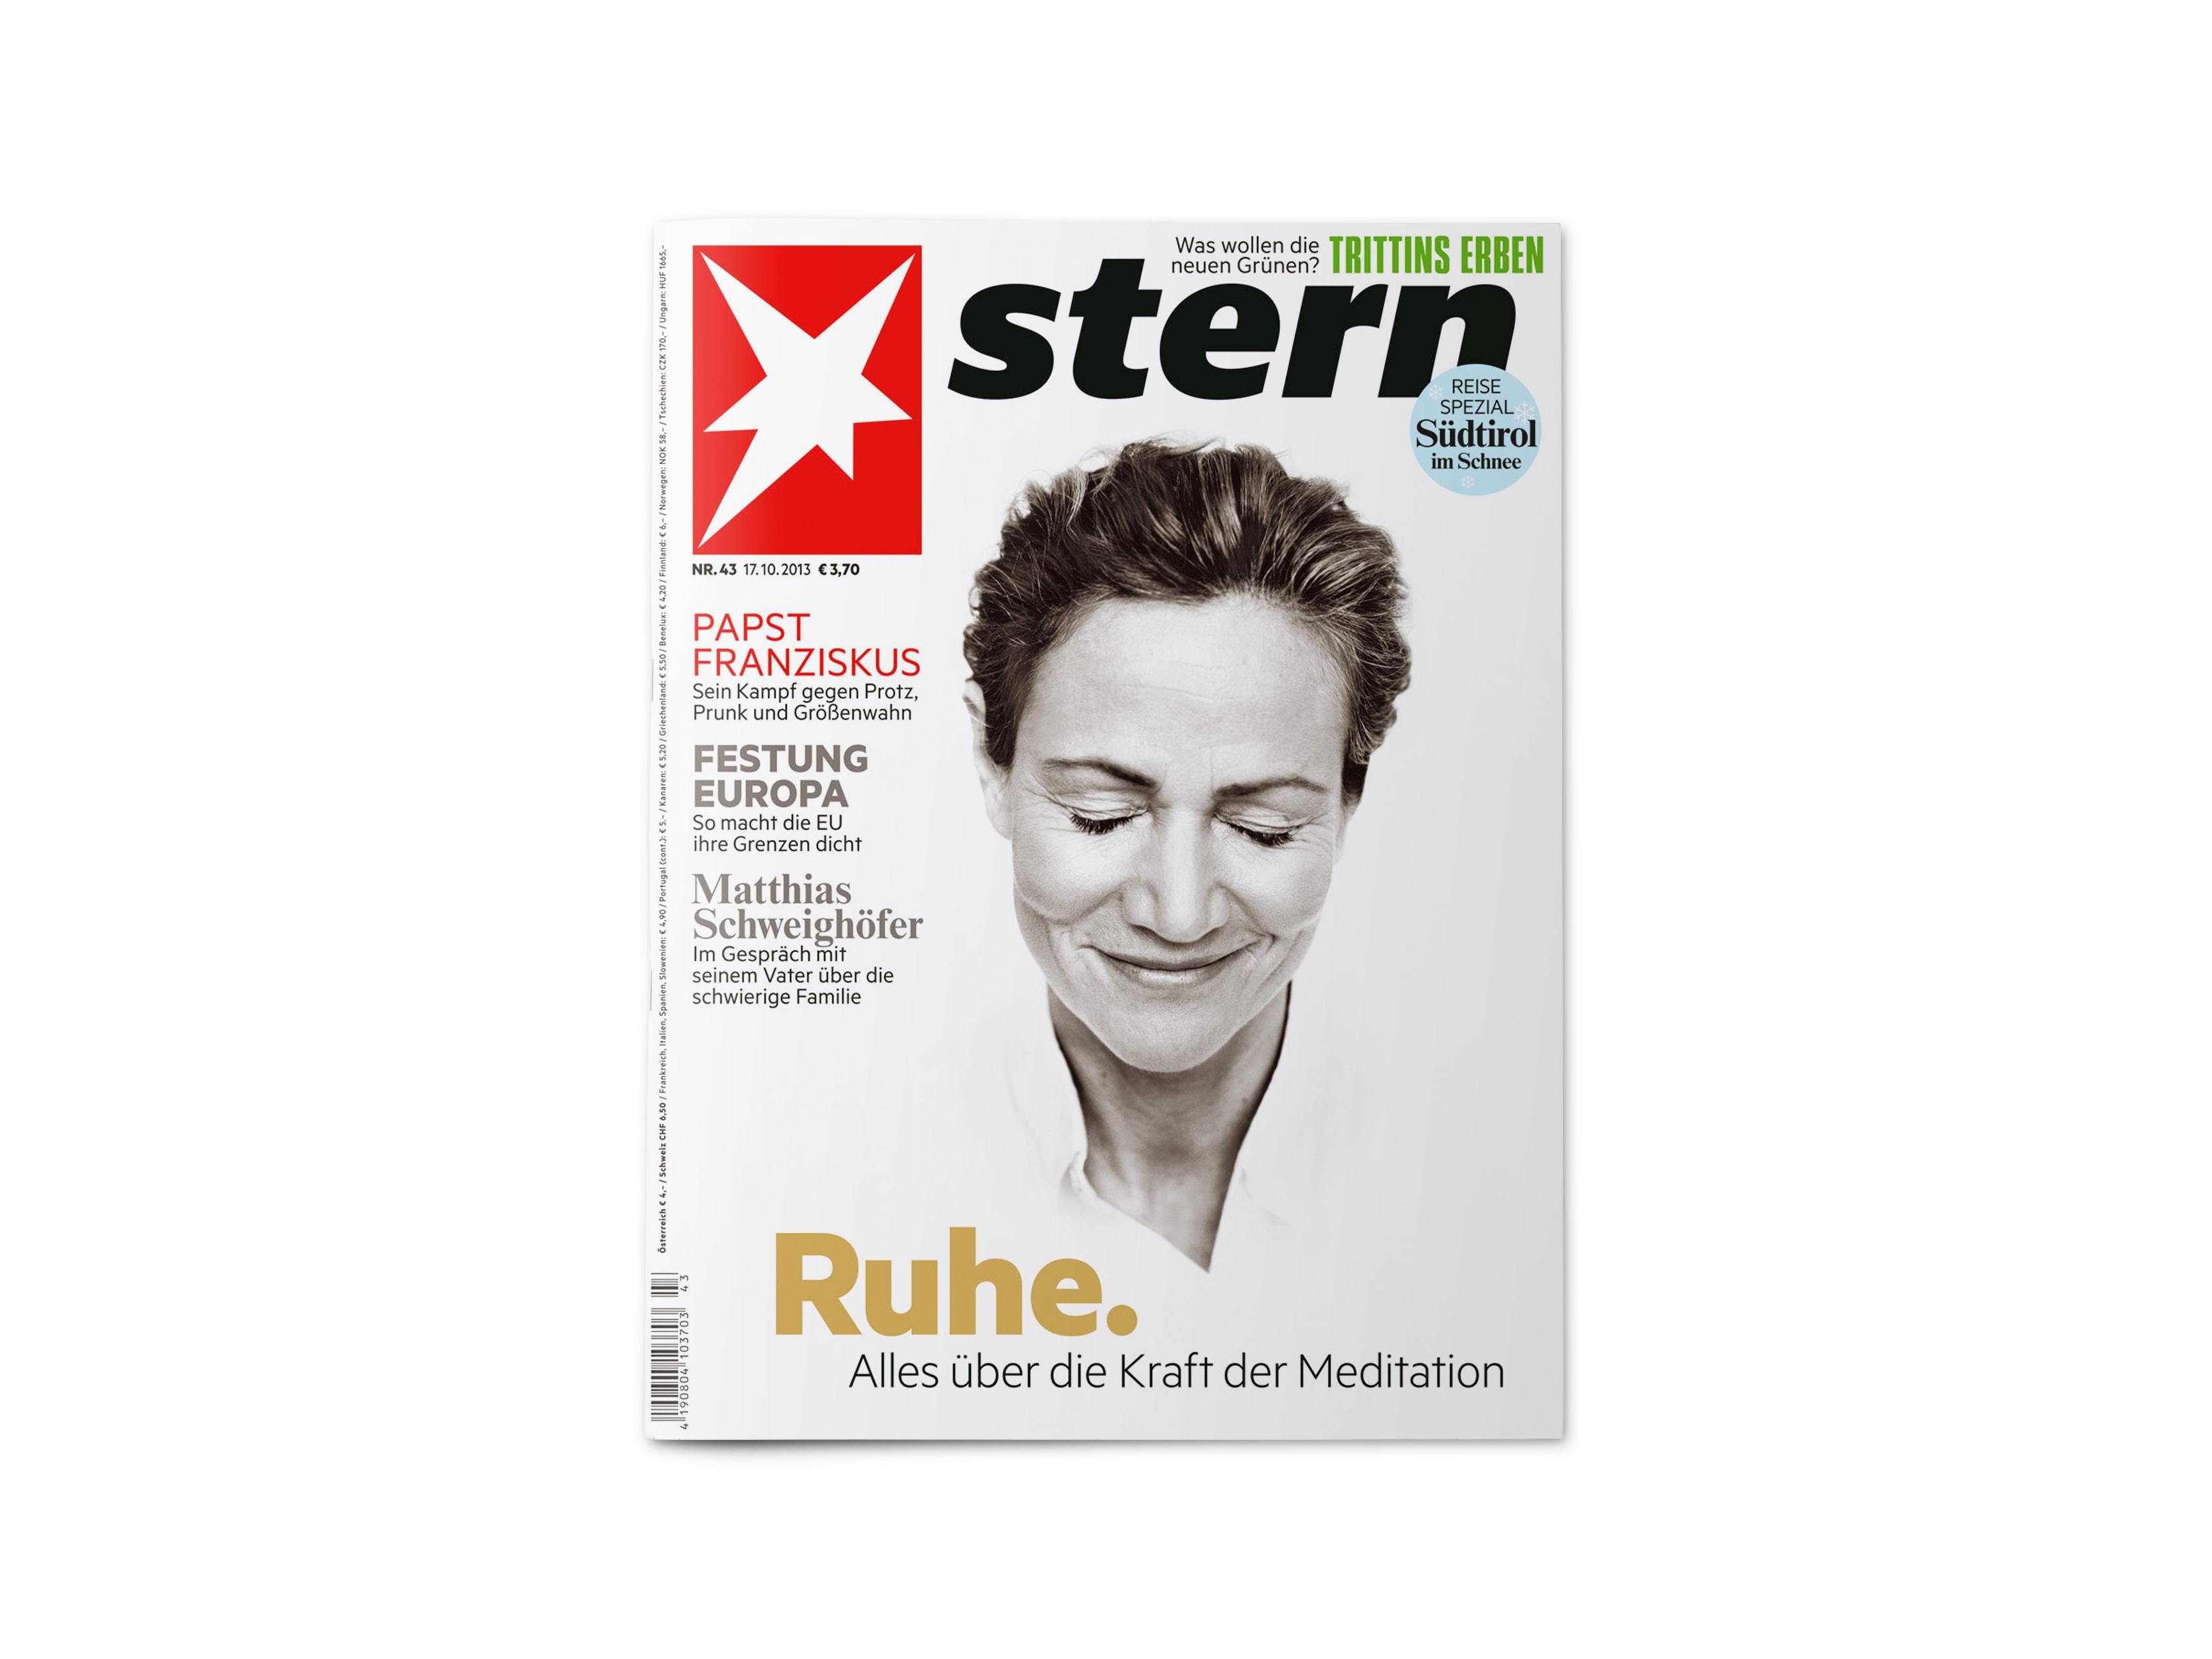 Bureau Johannes Erler – Stern